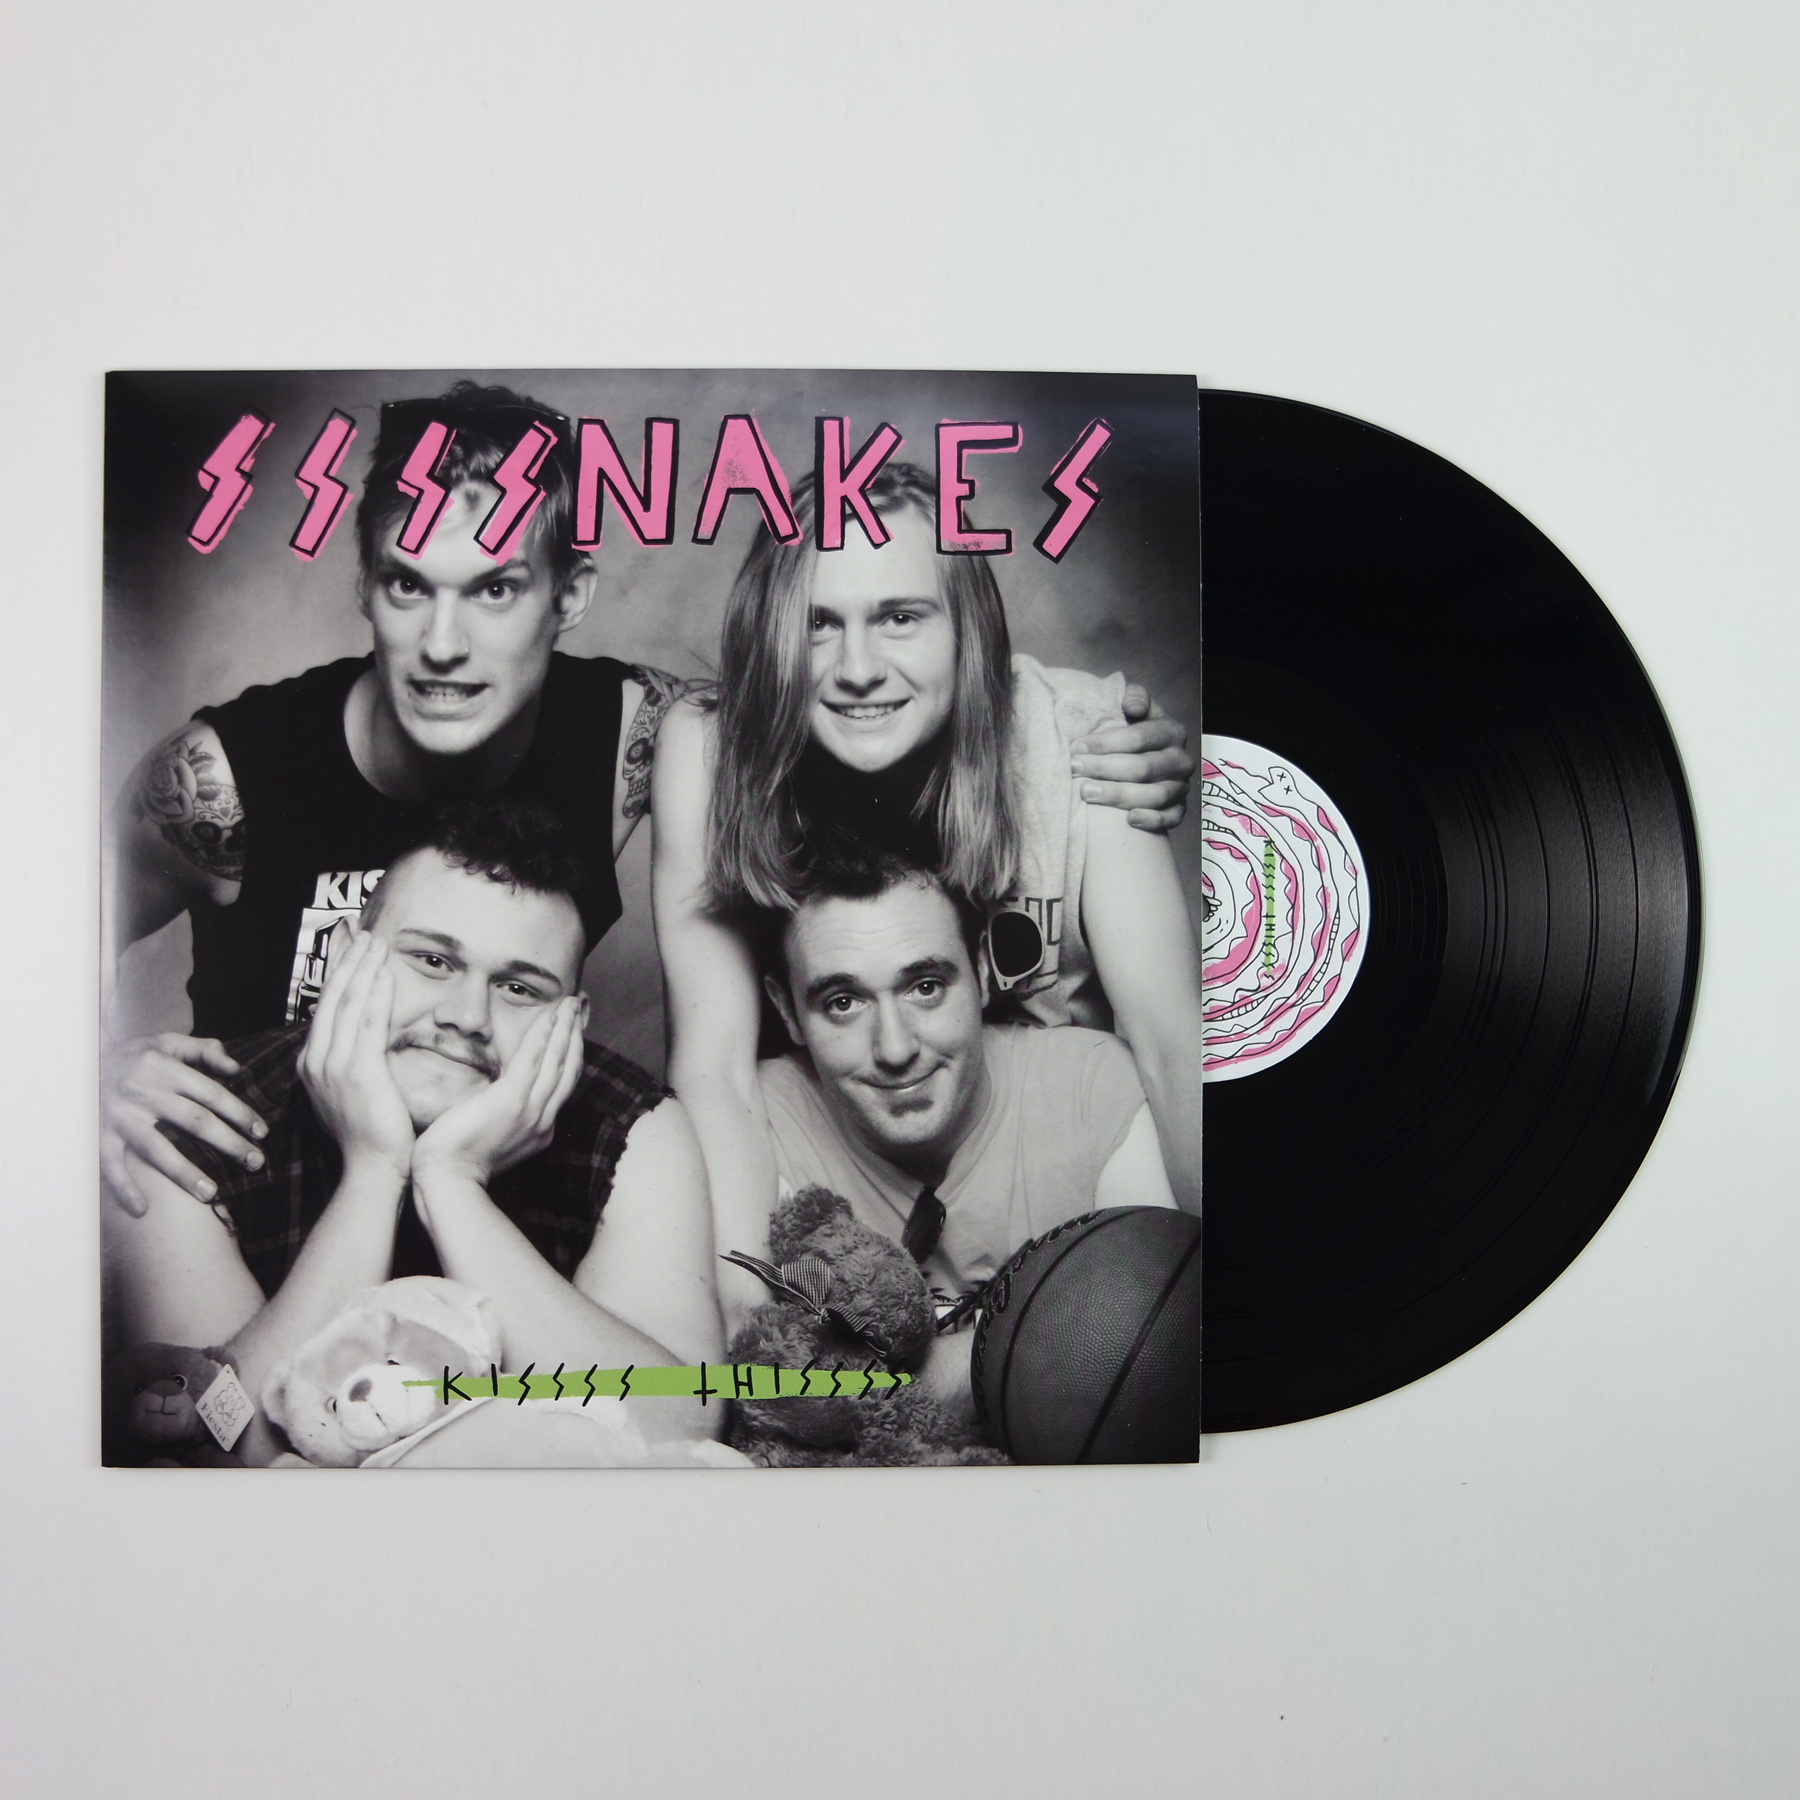 Ssssnakes - Kissss Thissss LP